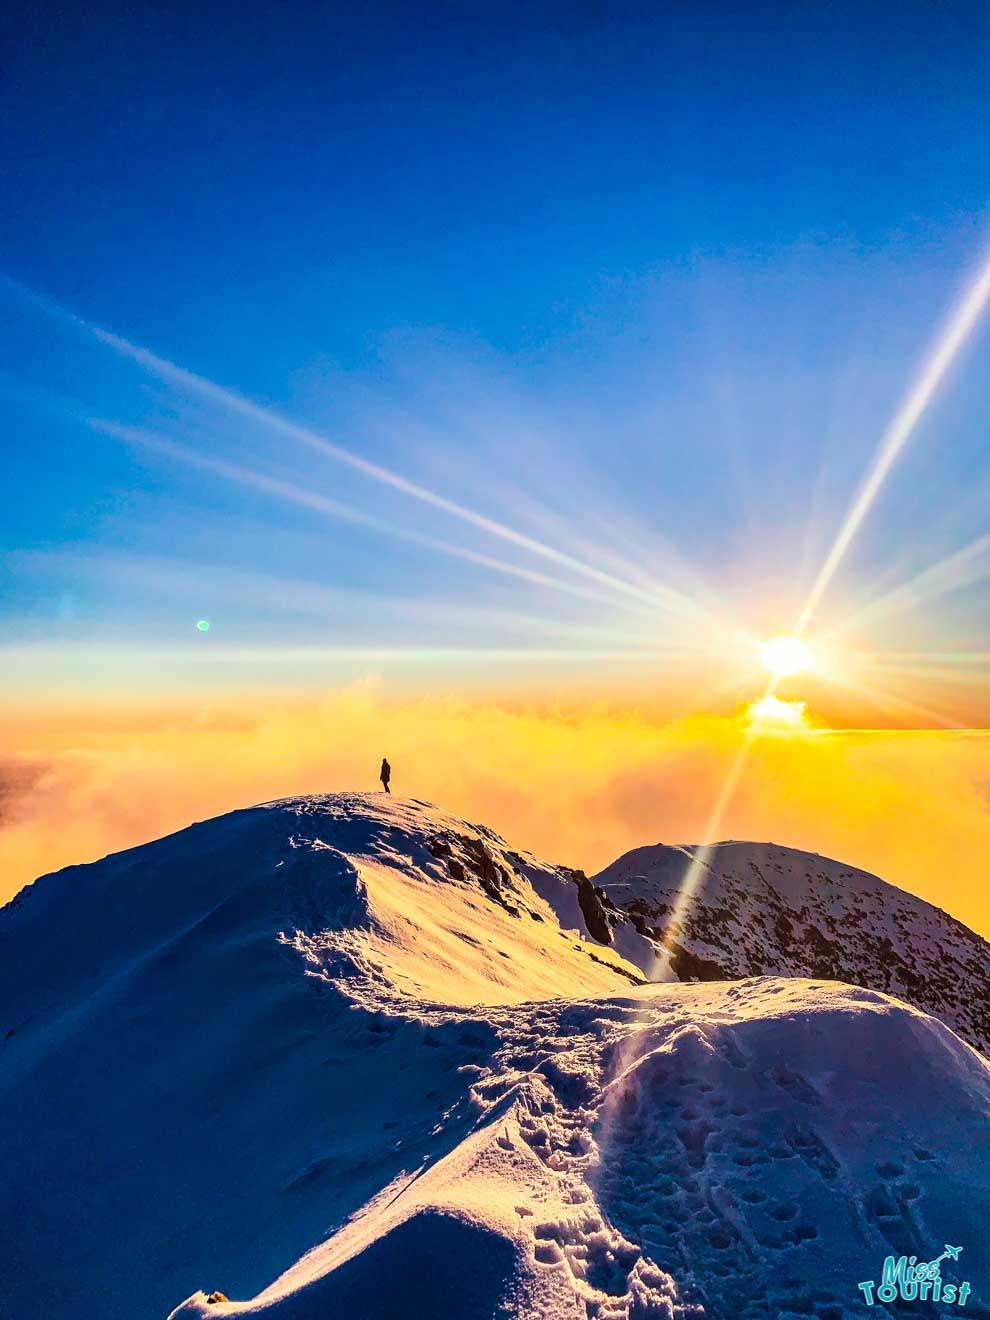 Comparing Mt Hotham, Mt Buller and Falls Creek ski resorts - Buller Sunglare Mt Buller or Mt Hotham